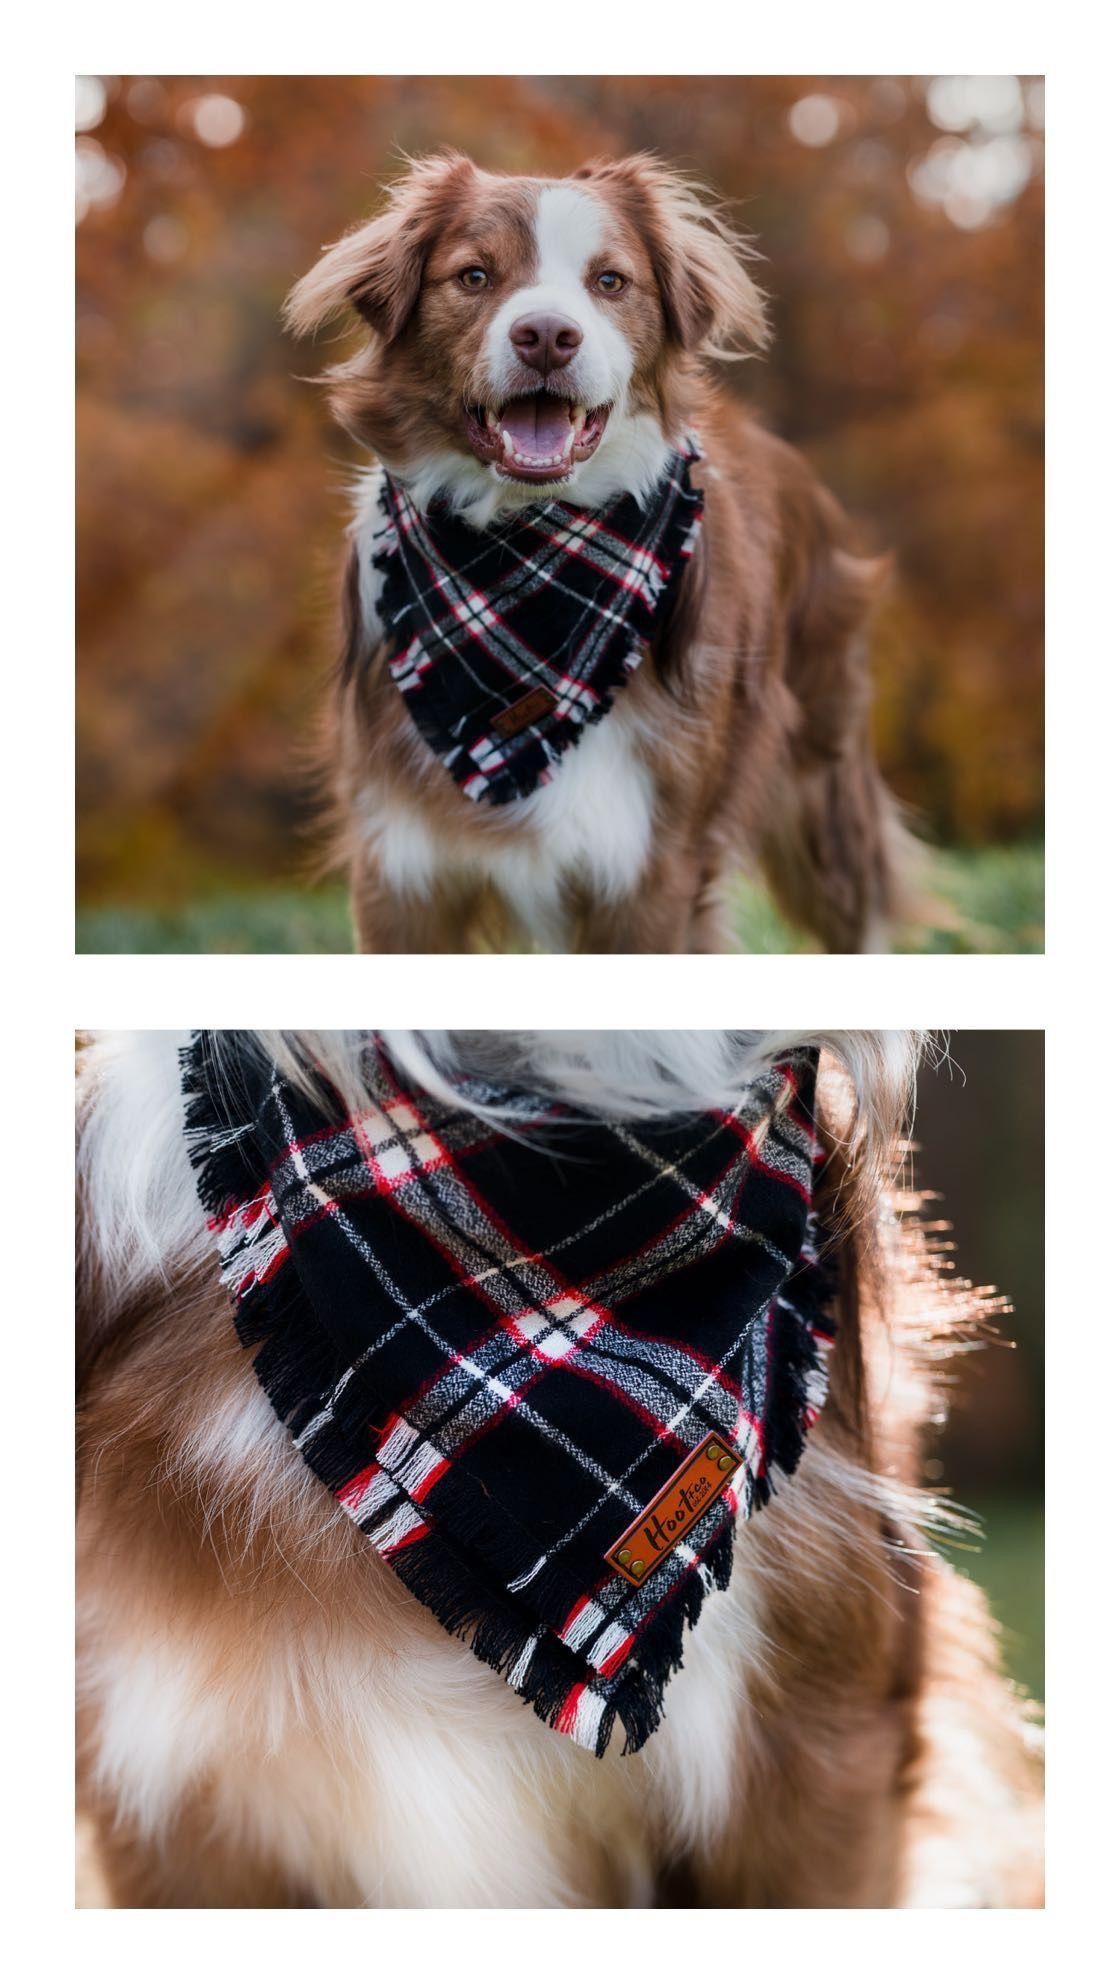 Hoot And Co Pet Bandana Dog Bandana Plaid Bandana Frayed Dog Bandana Pet Lover Gift Scarf Bandana Set Match Dog Store Dog Supplies Online Dog Supplies